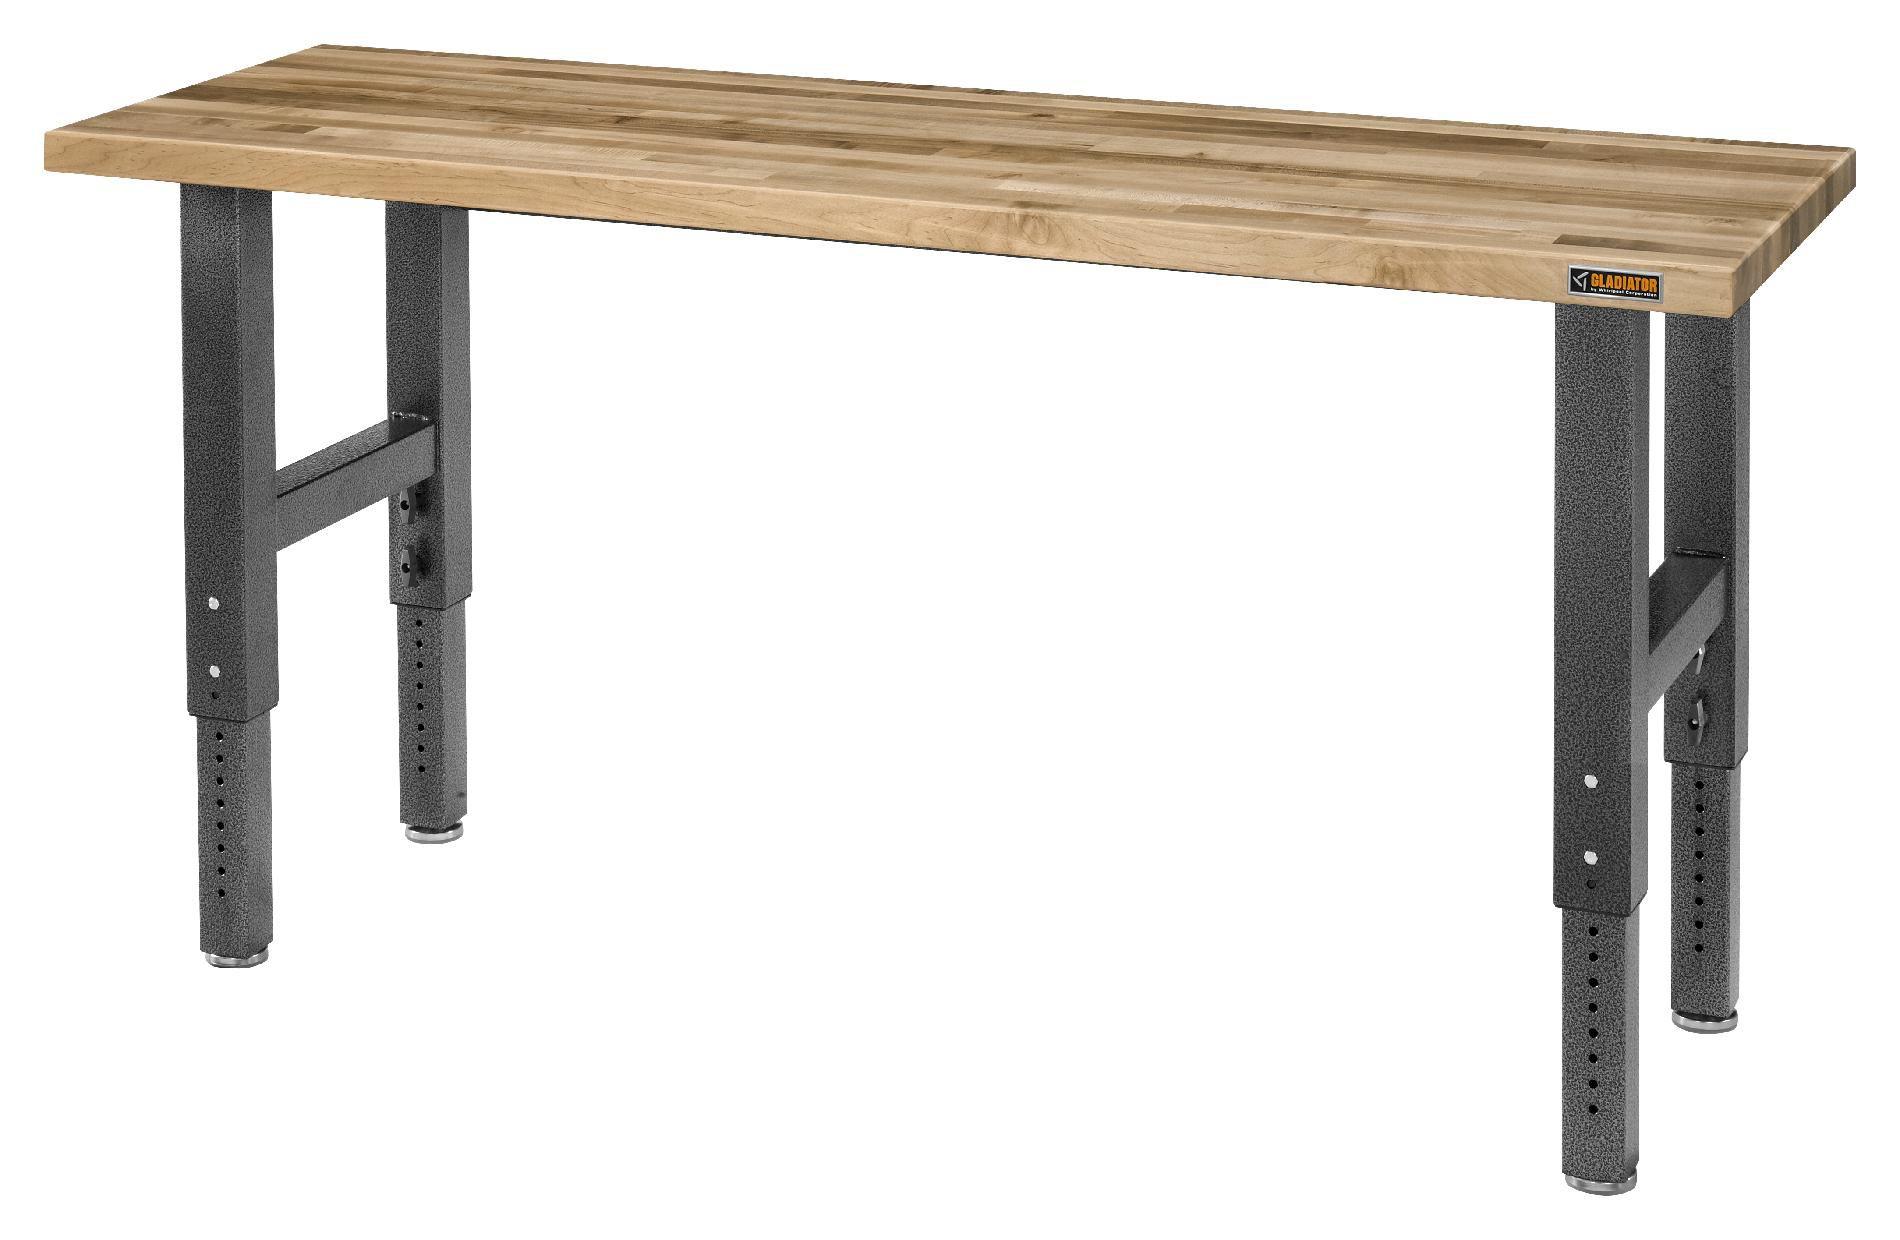 Gladiator Adjustable Height 6' Maple Workbench